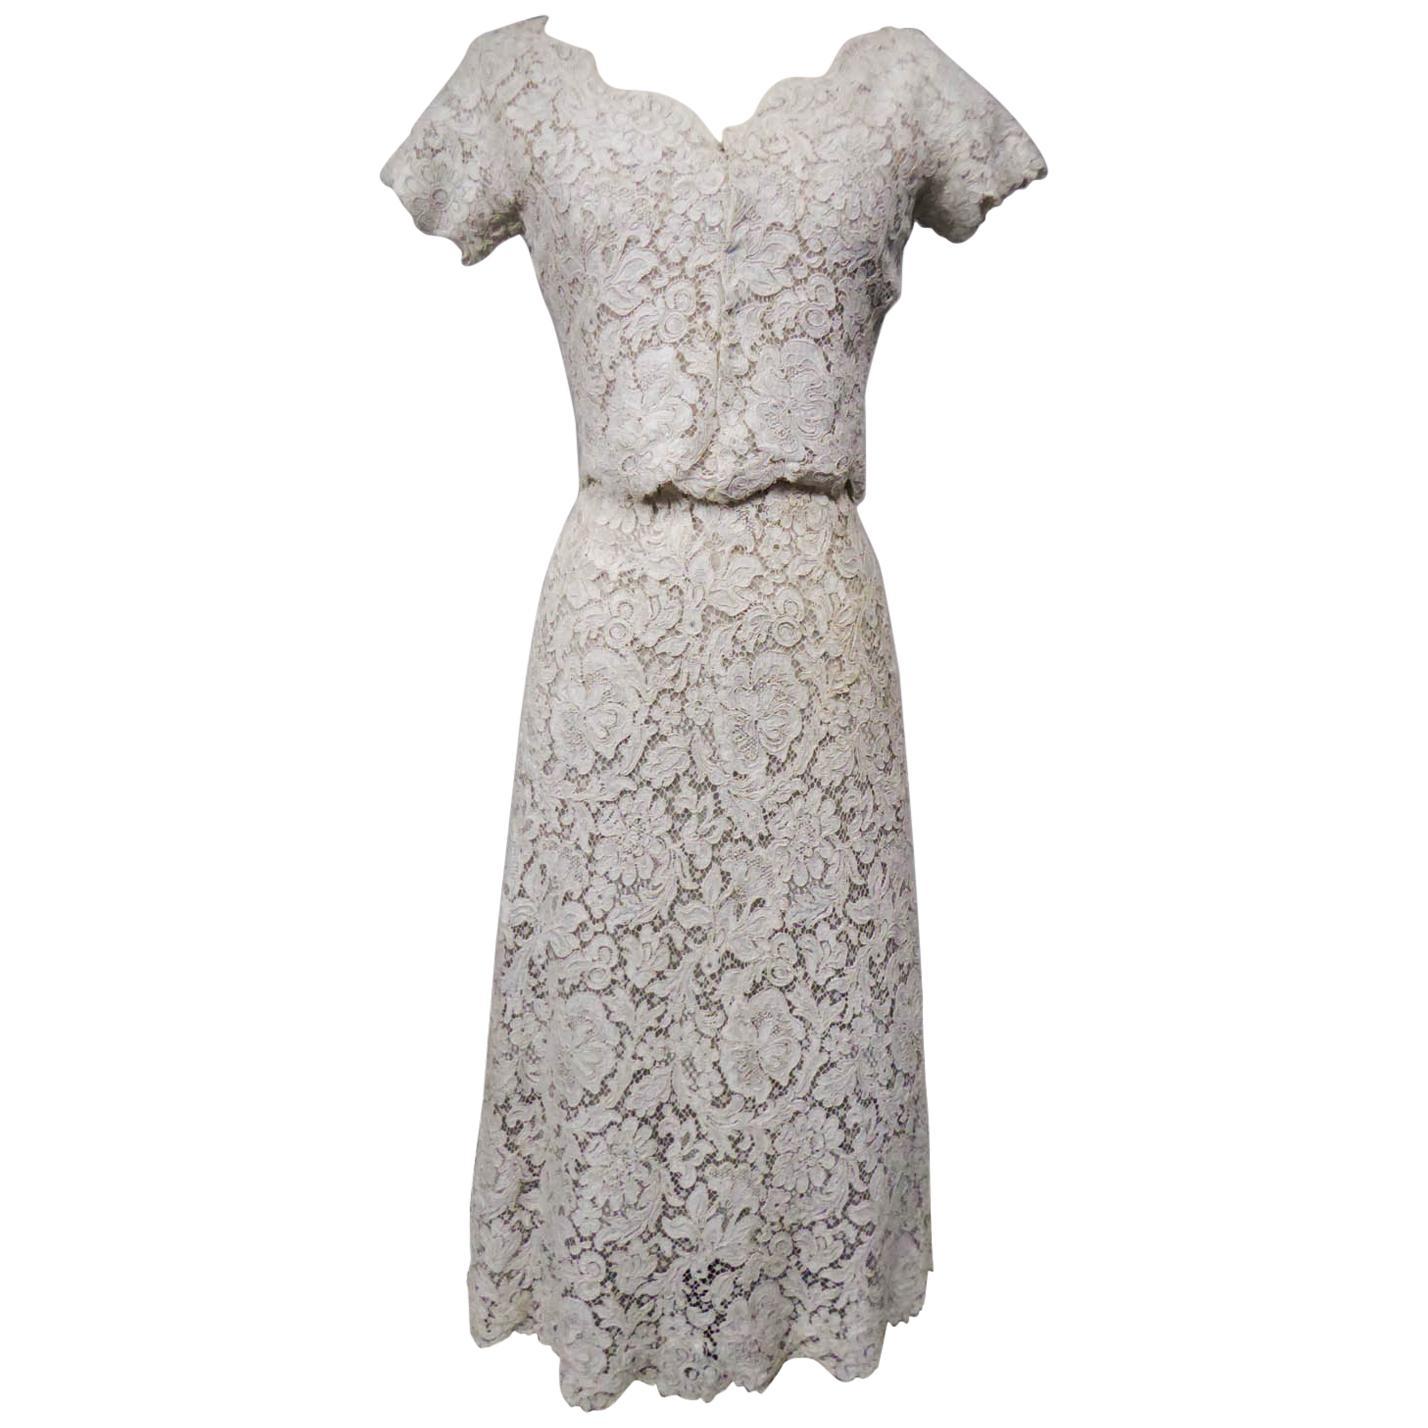 A Dior/ Bohan Couture Cream Lace Dress and Bolero numbered 94445 Circa 1965